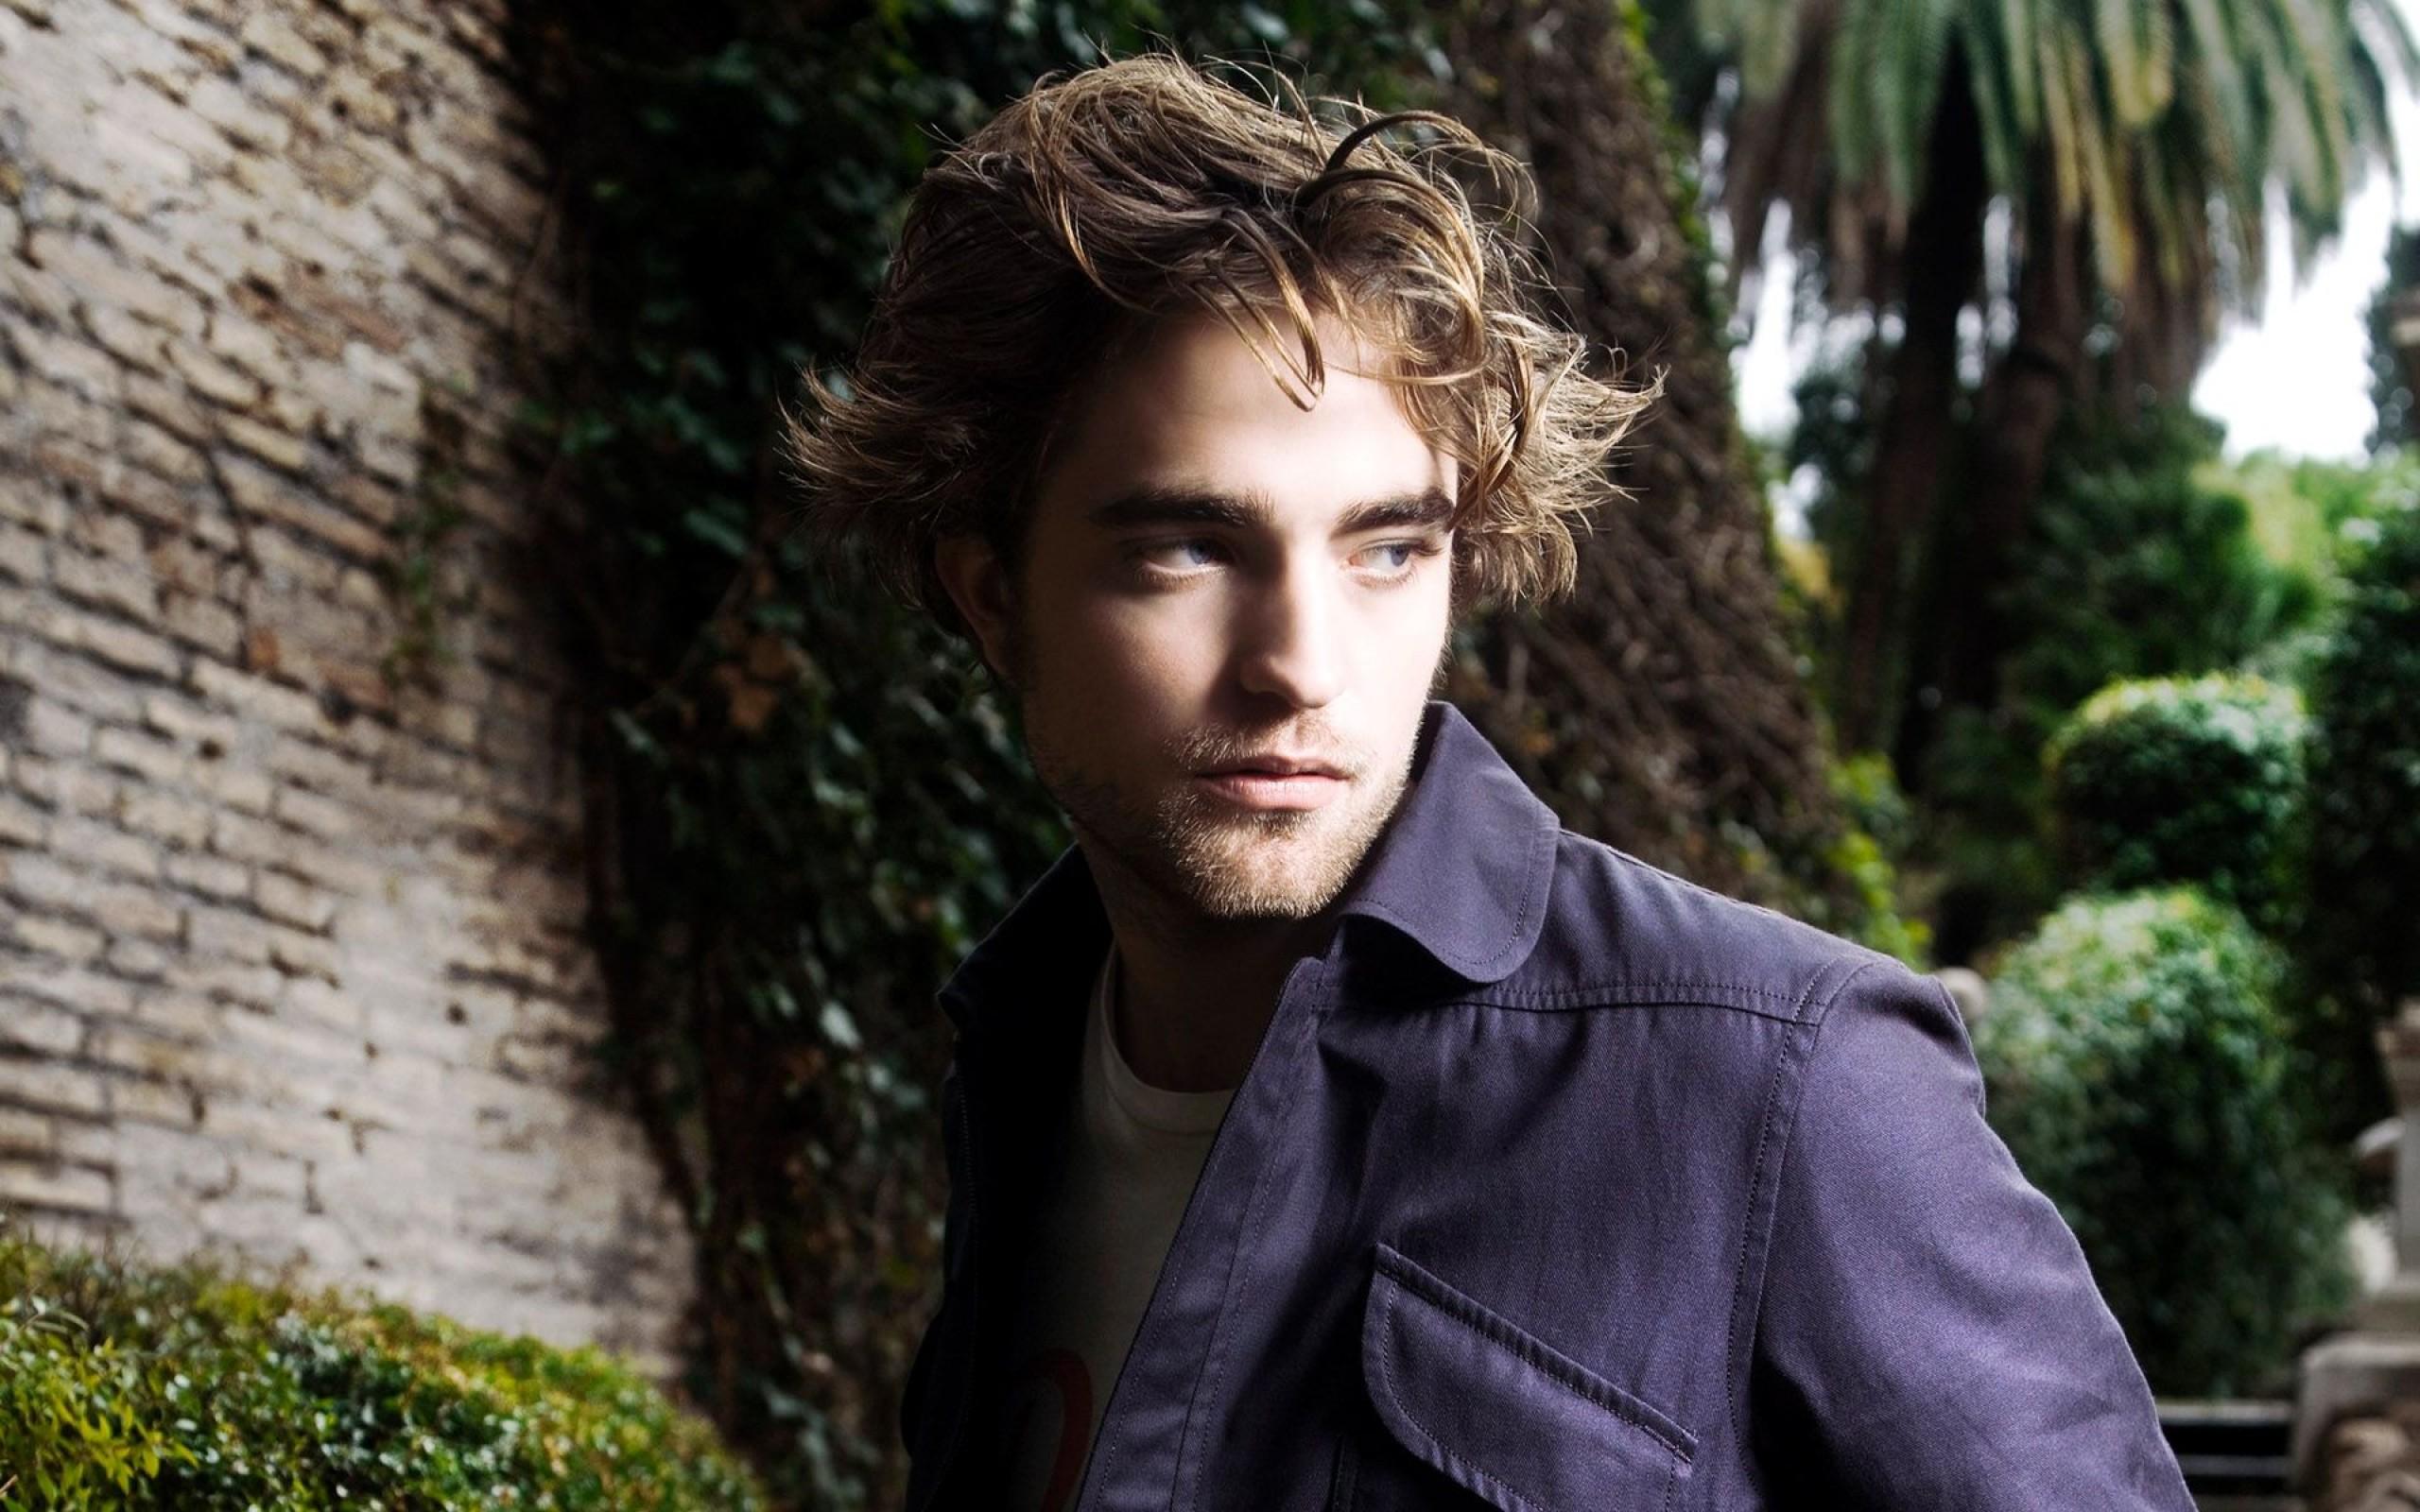 37060 descargar fondo de pantalla Personas, Actores, Hombres, Robert Pattinson: protectores de pantalla e imágenes gratis